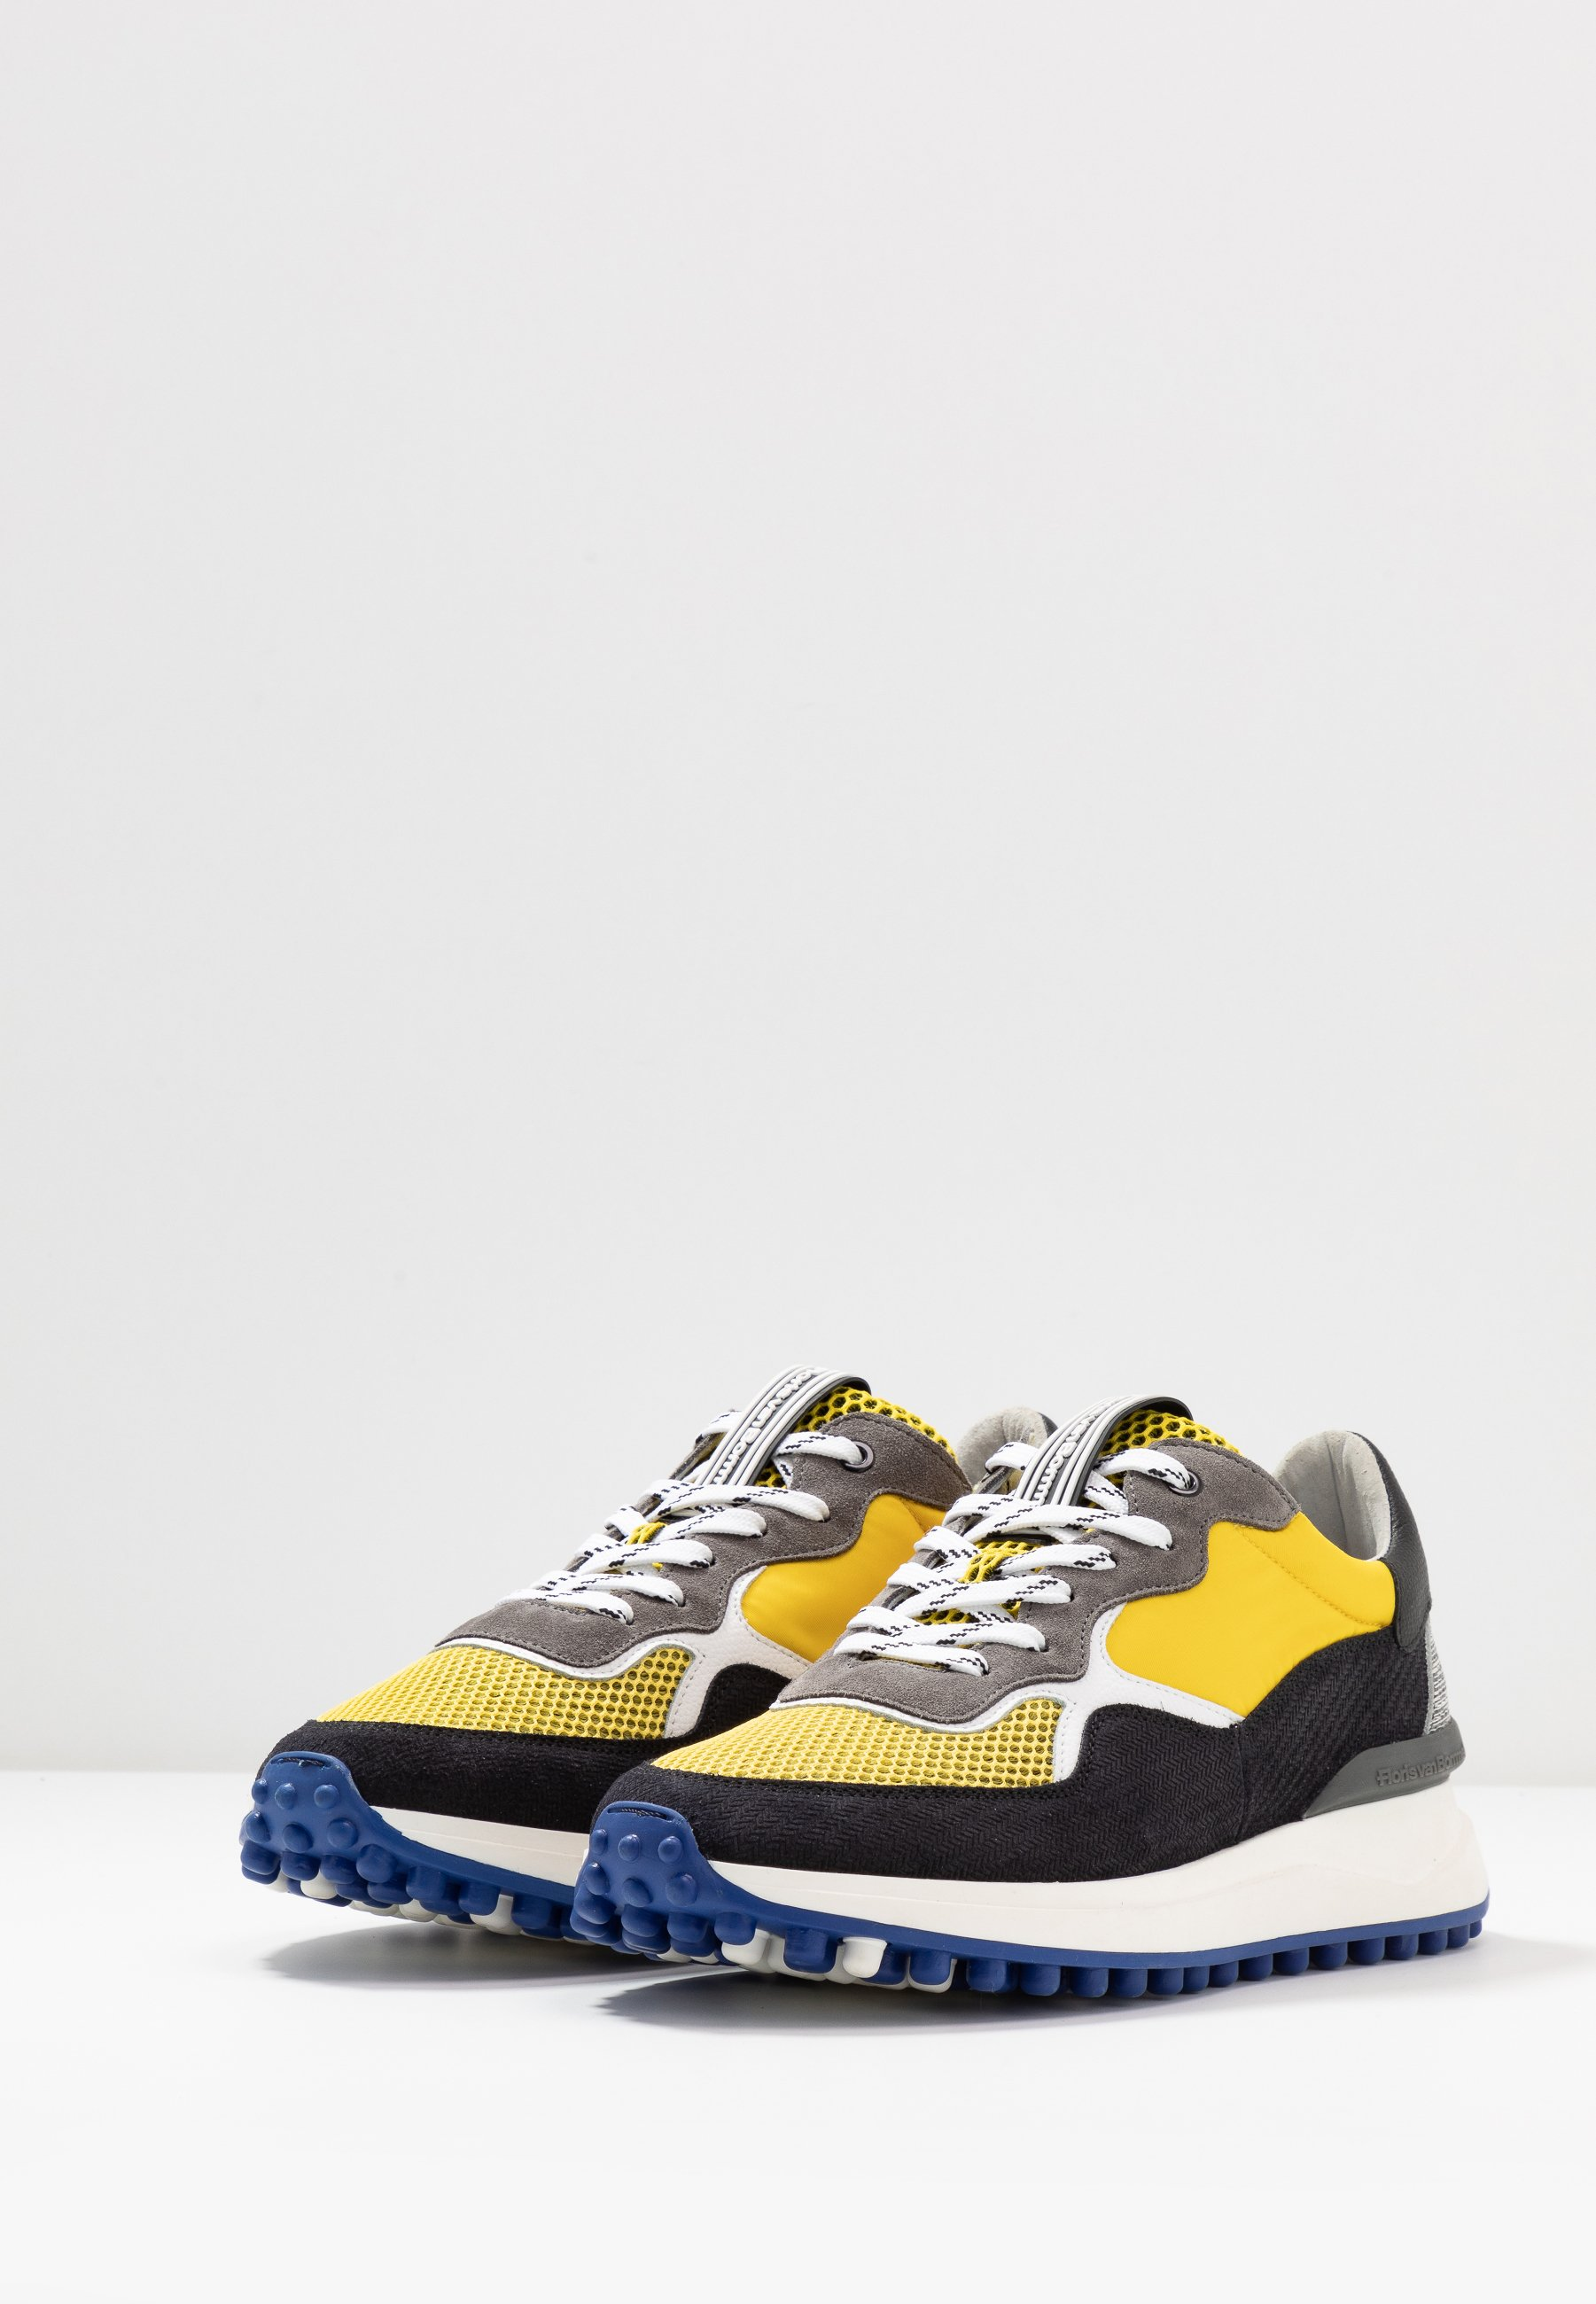 Floris Van Bommel Sneaker Low - Yellow Black Friday